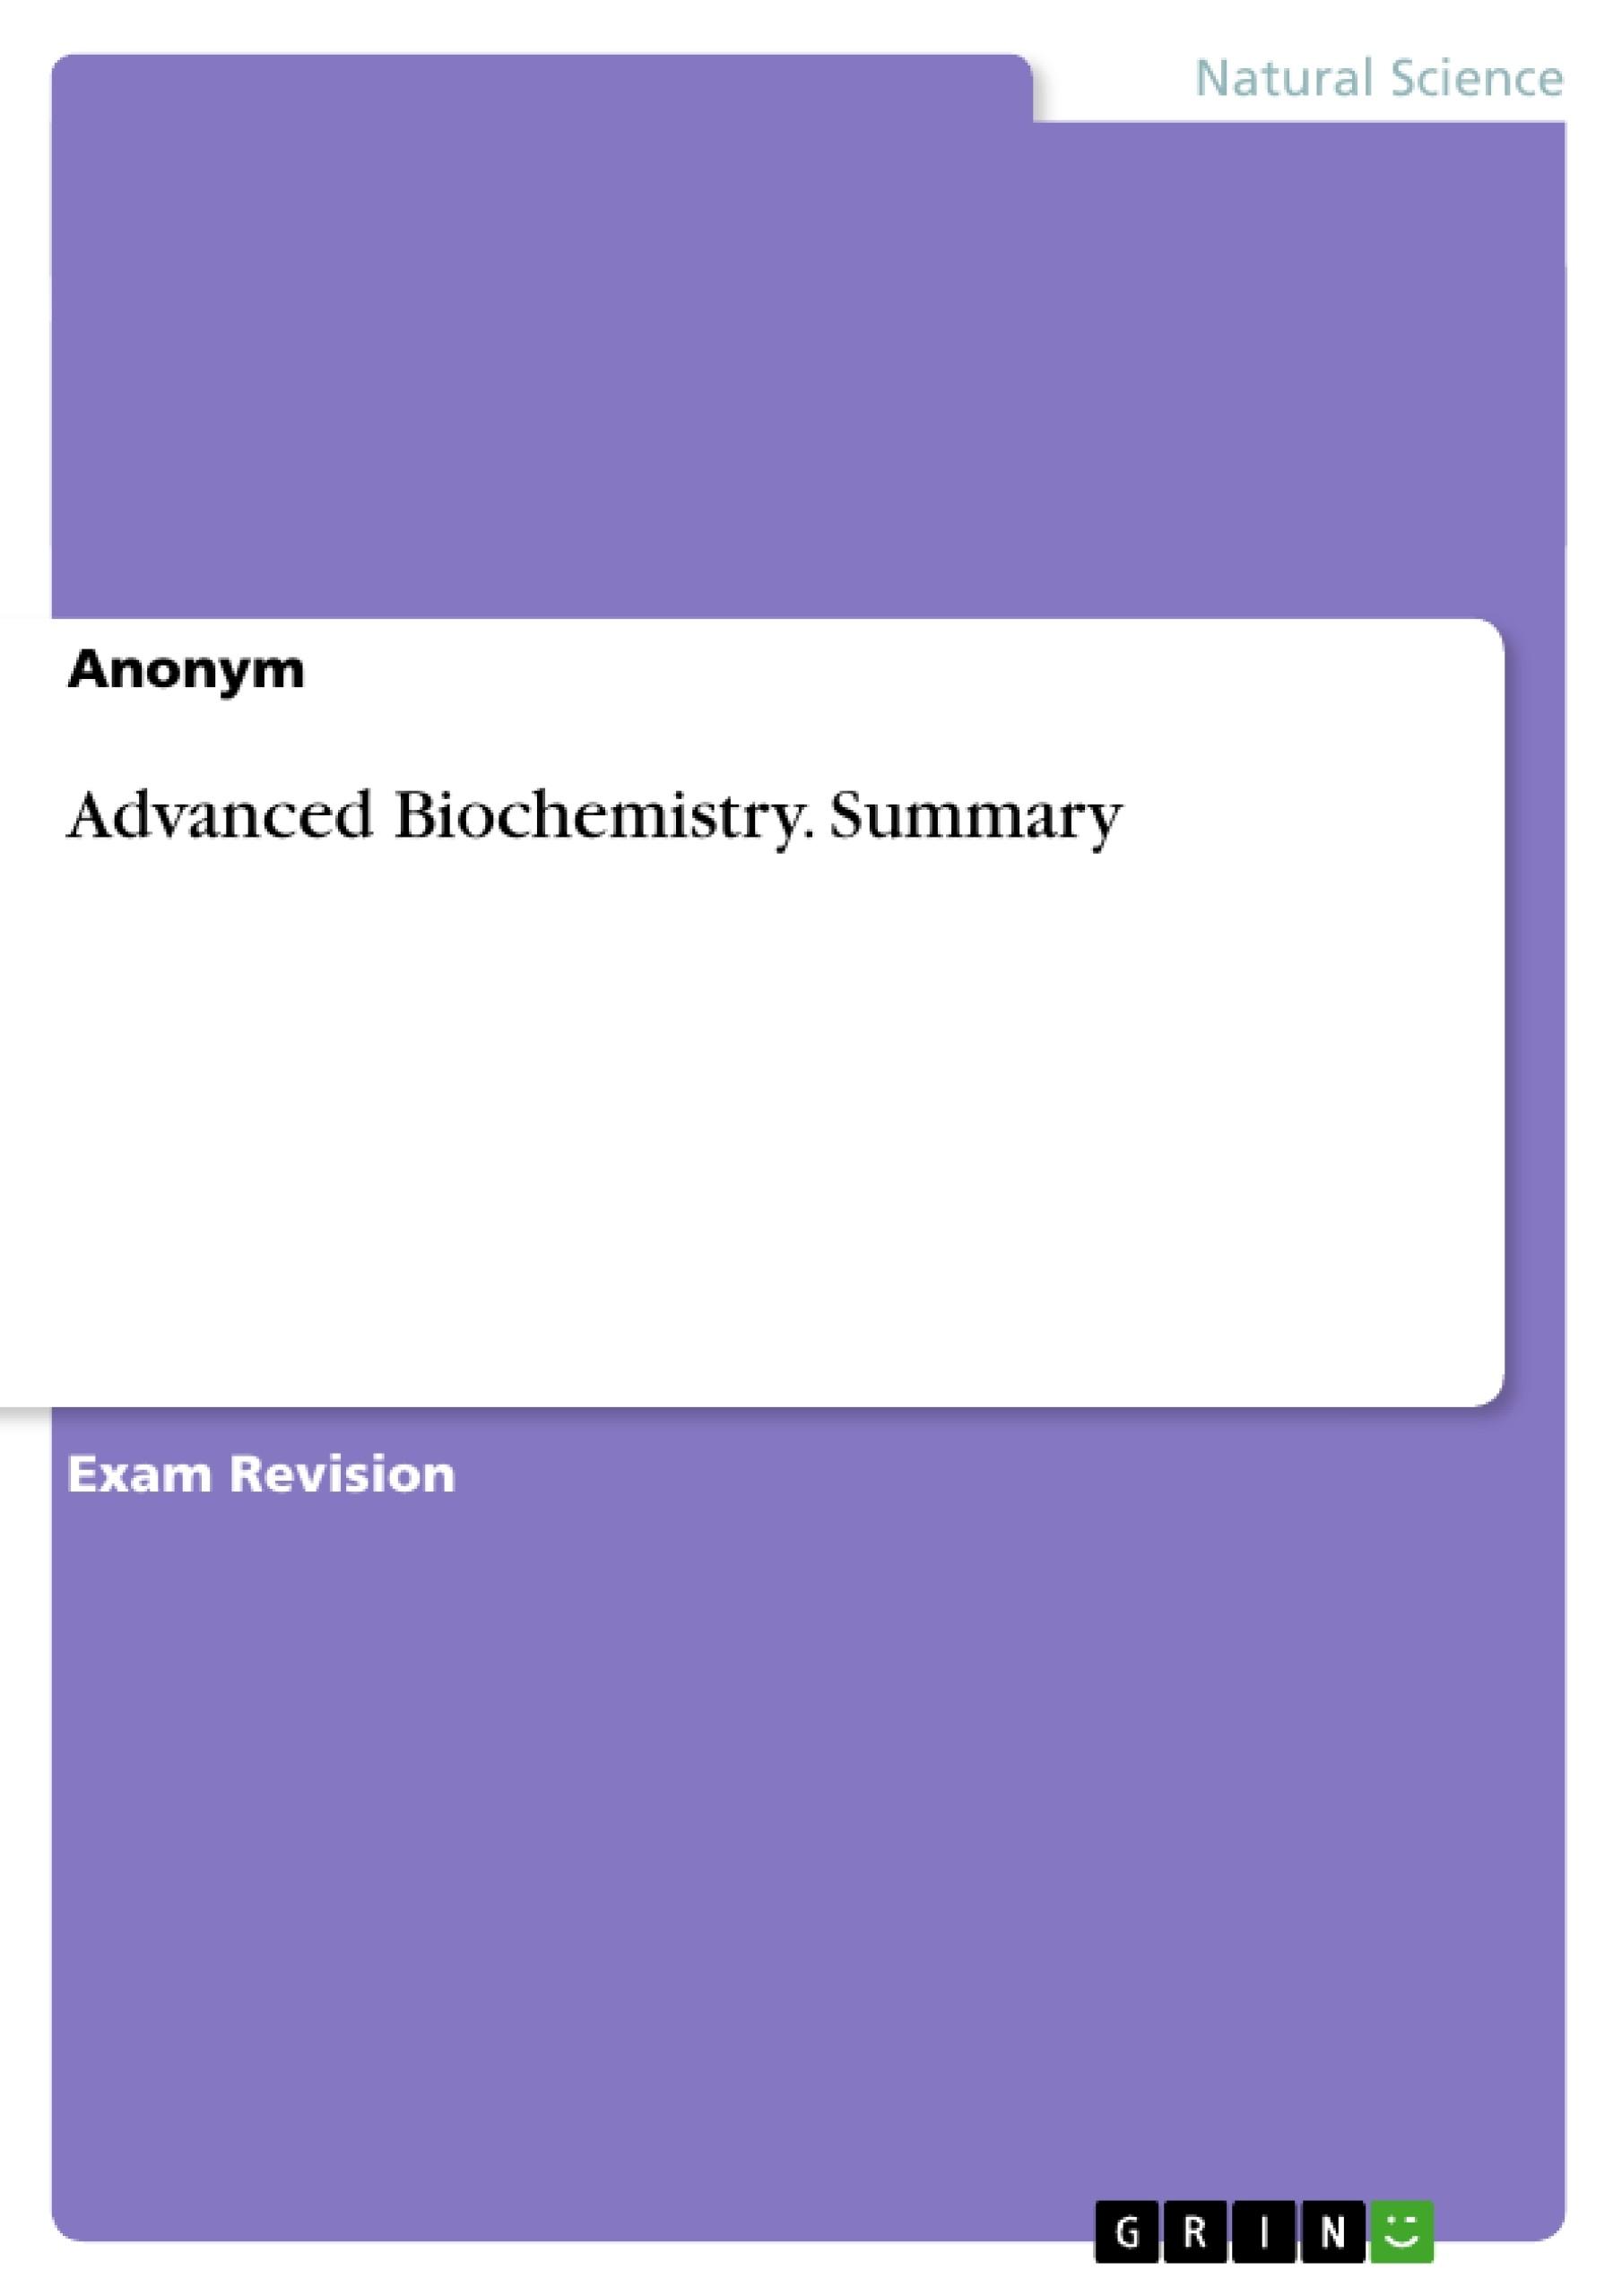 Title: Advanced Biochemistry. Summary